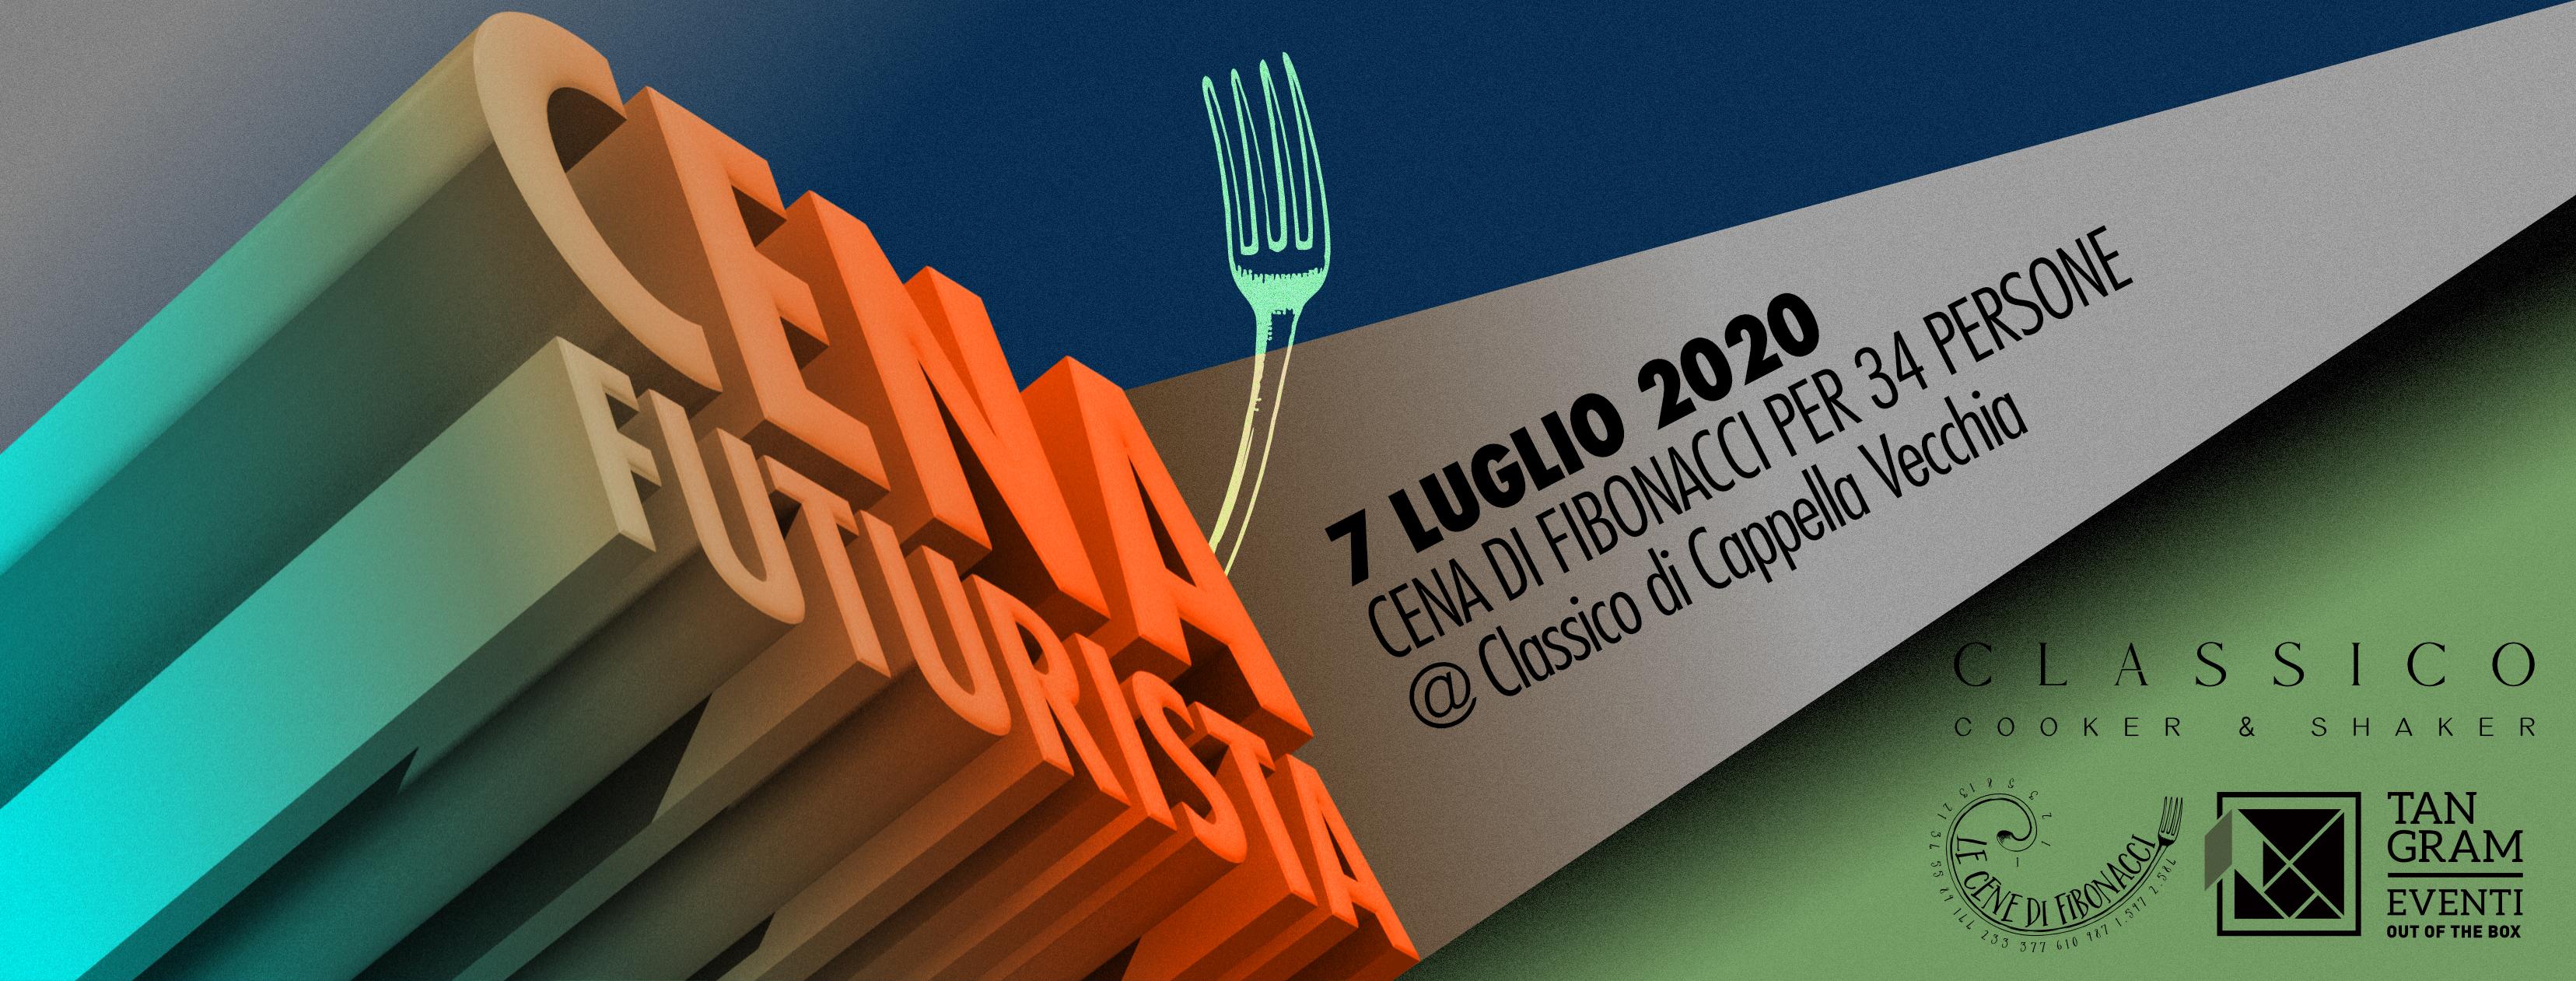 Cena Futurista - Cene di Fibonacci #34 - martedì 7 luglio 2020